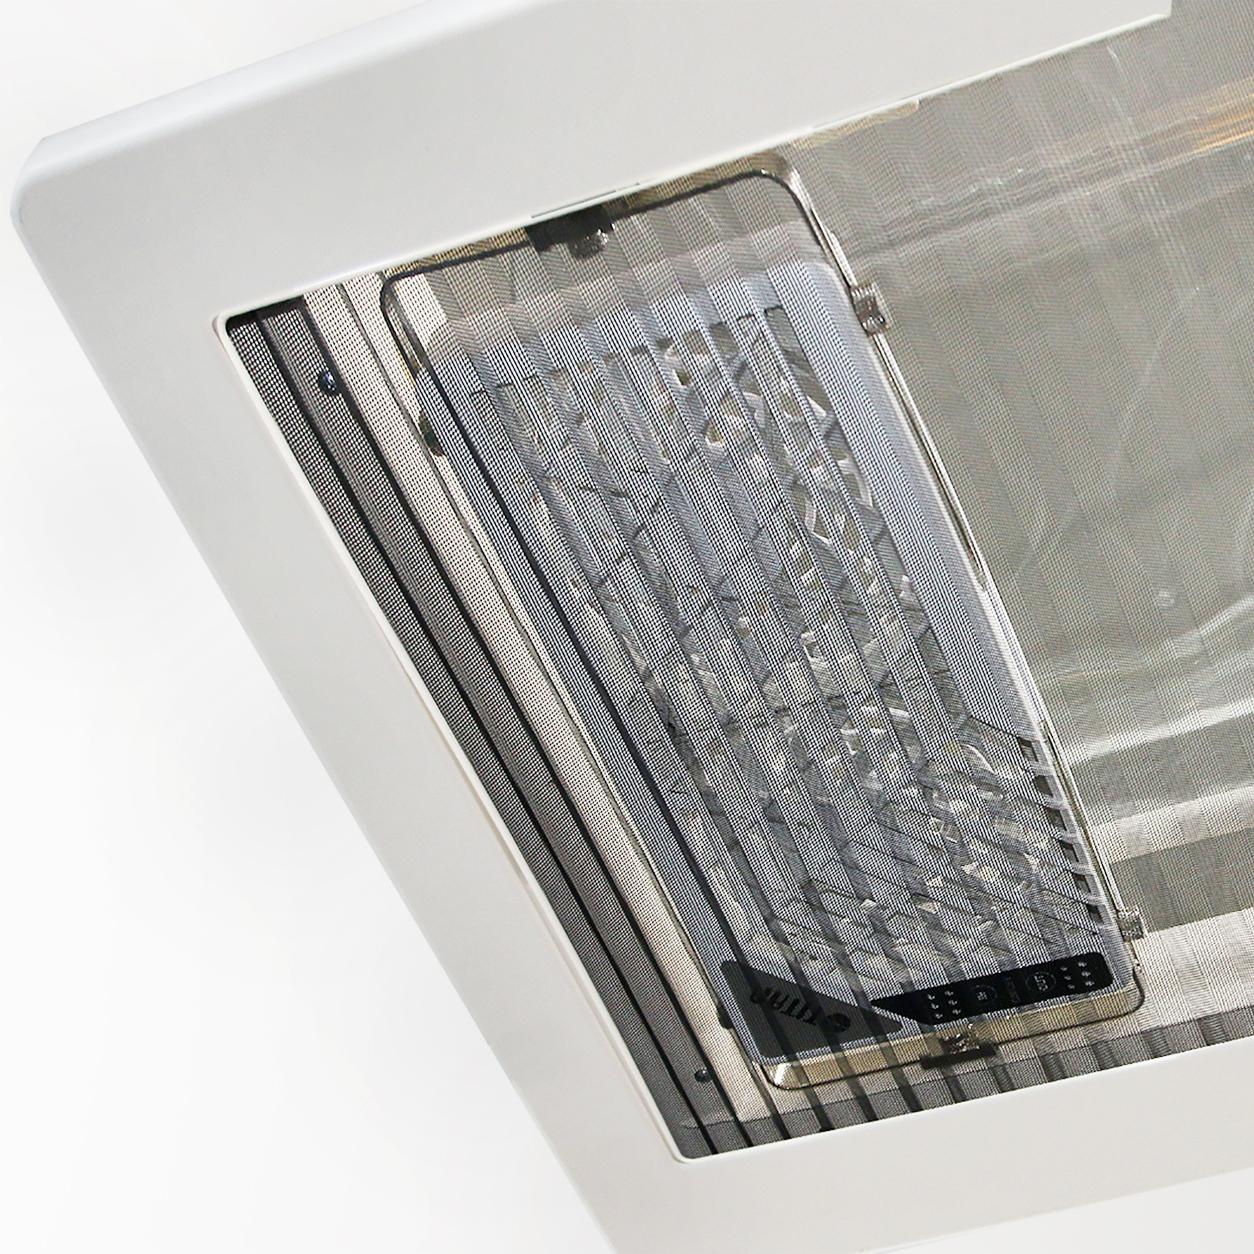 12v Dc Double Reversible Roof Window Ventilation Fan For